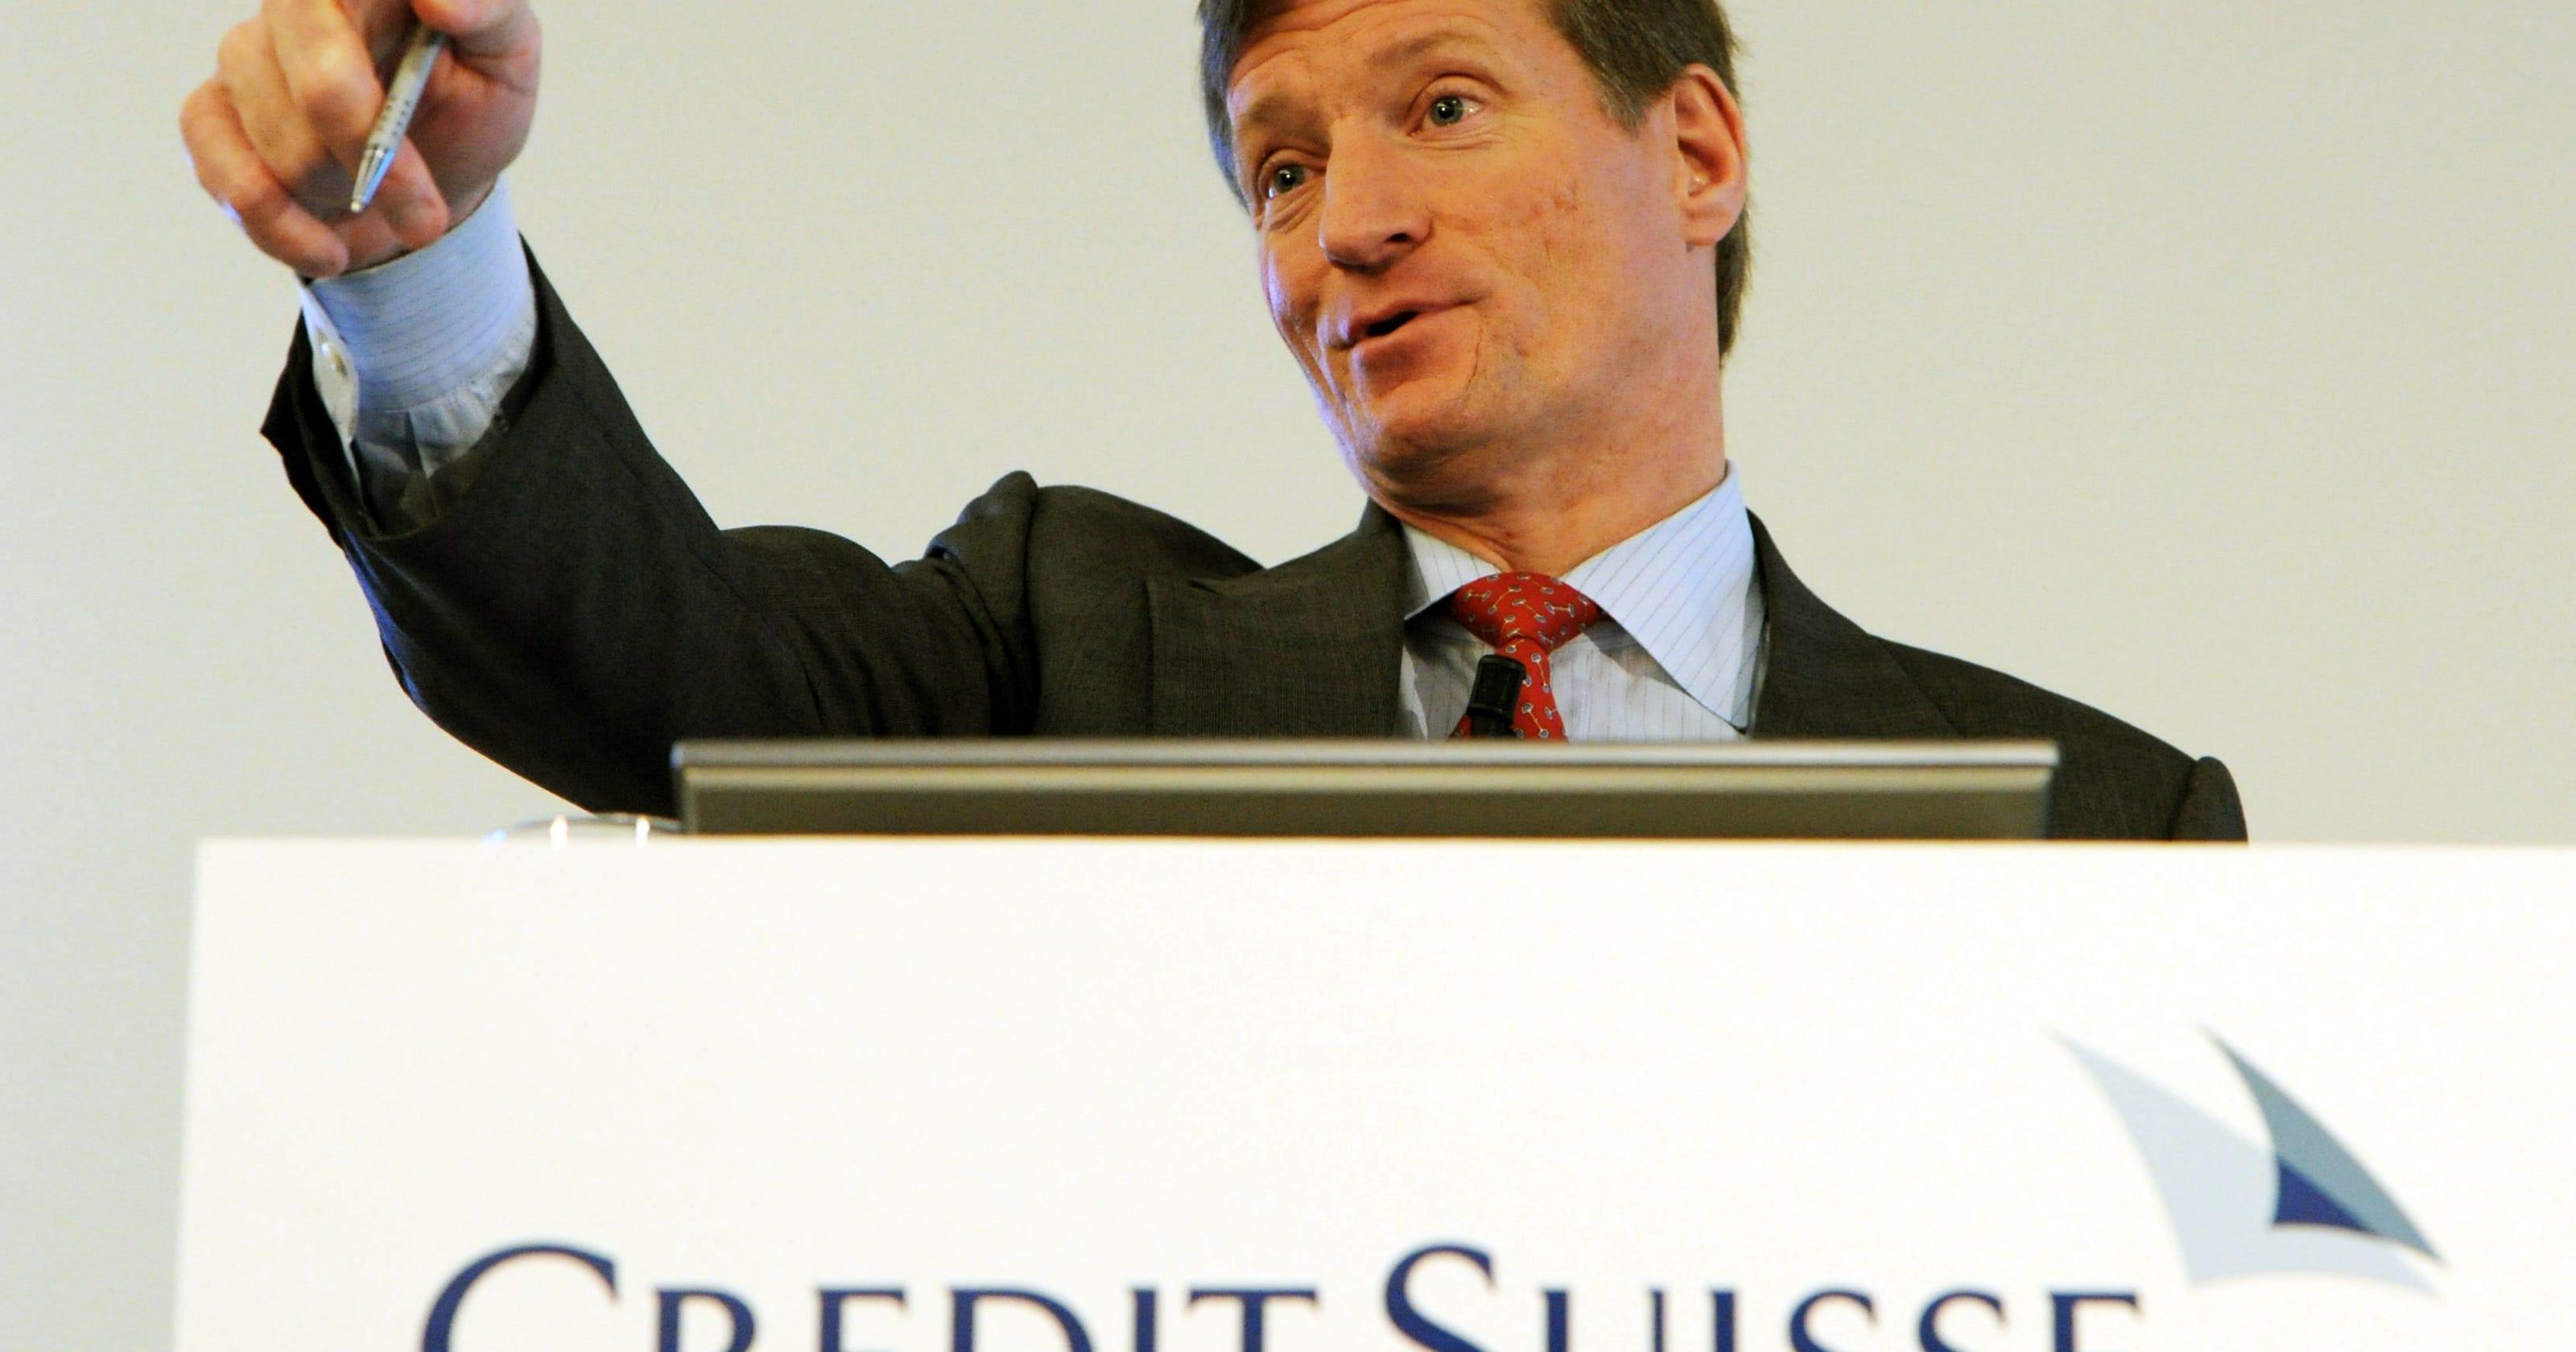 Credit Suisse buys Morgan Stanley wealth unit